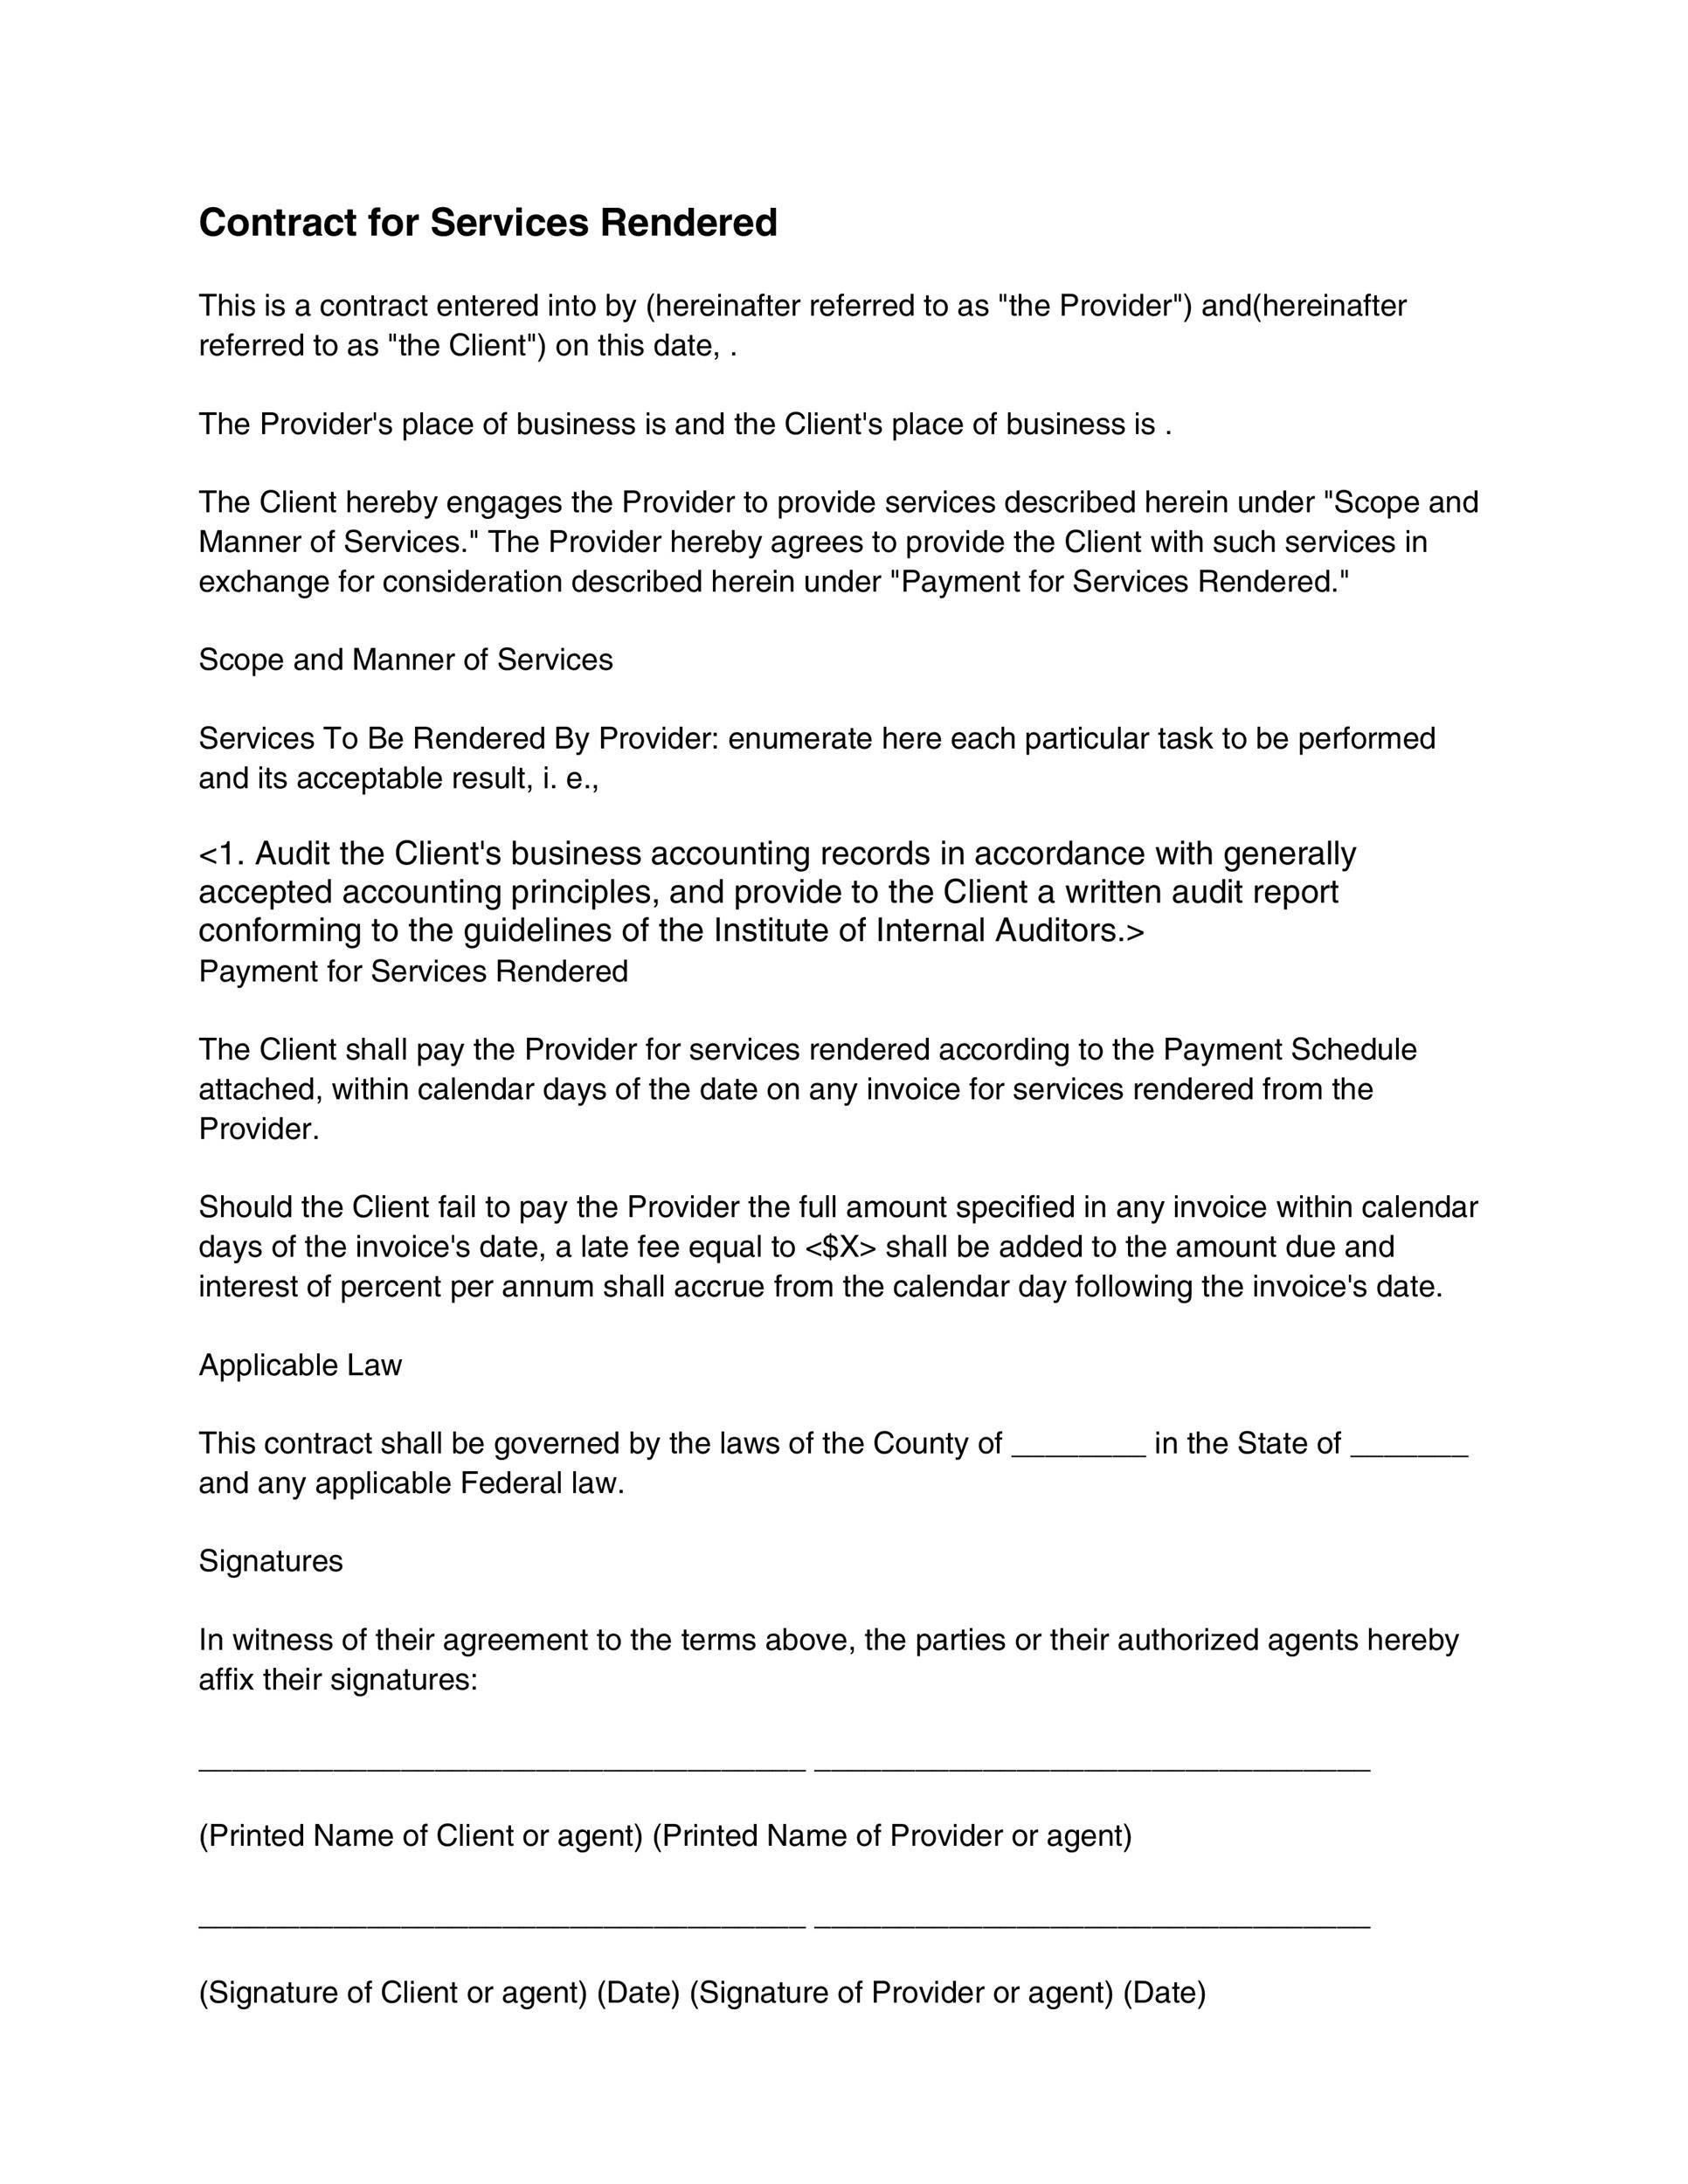 004 Beautiful Legally Binding Contract Template Design  Australia Term 3 Example SampleFull